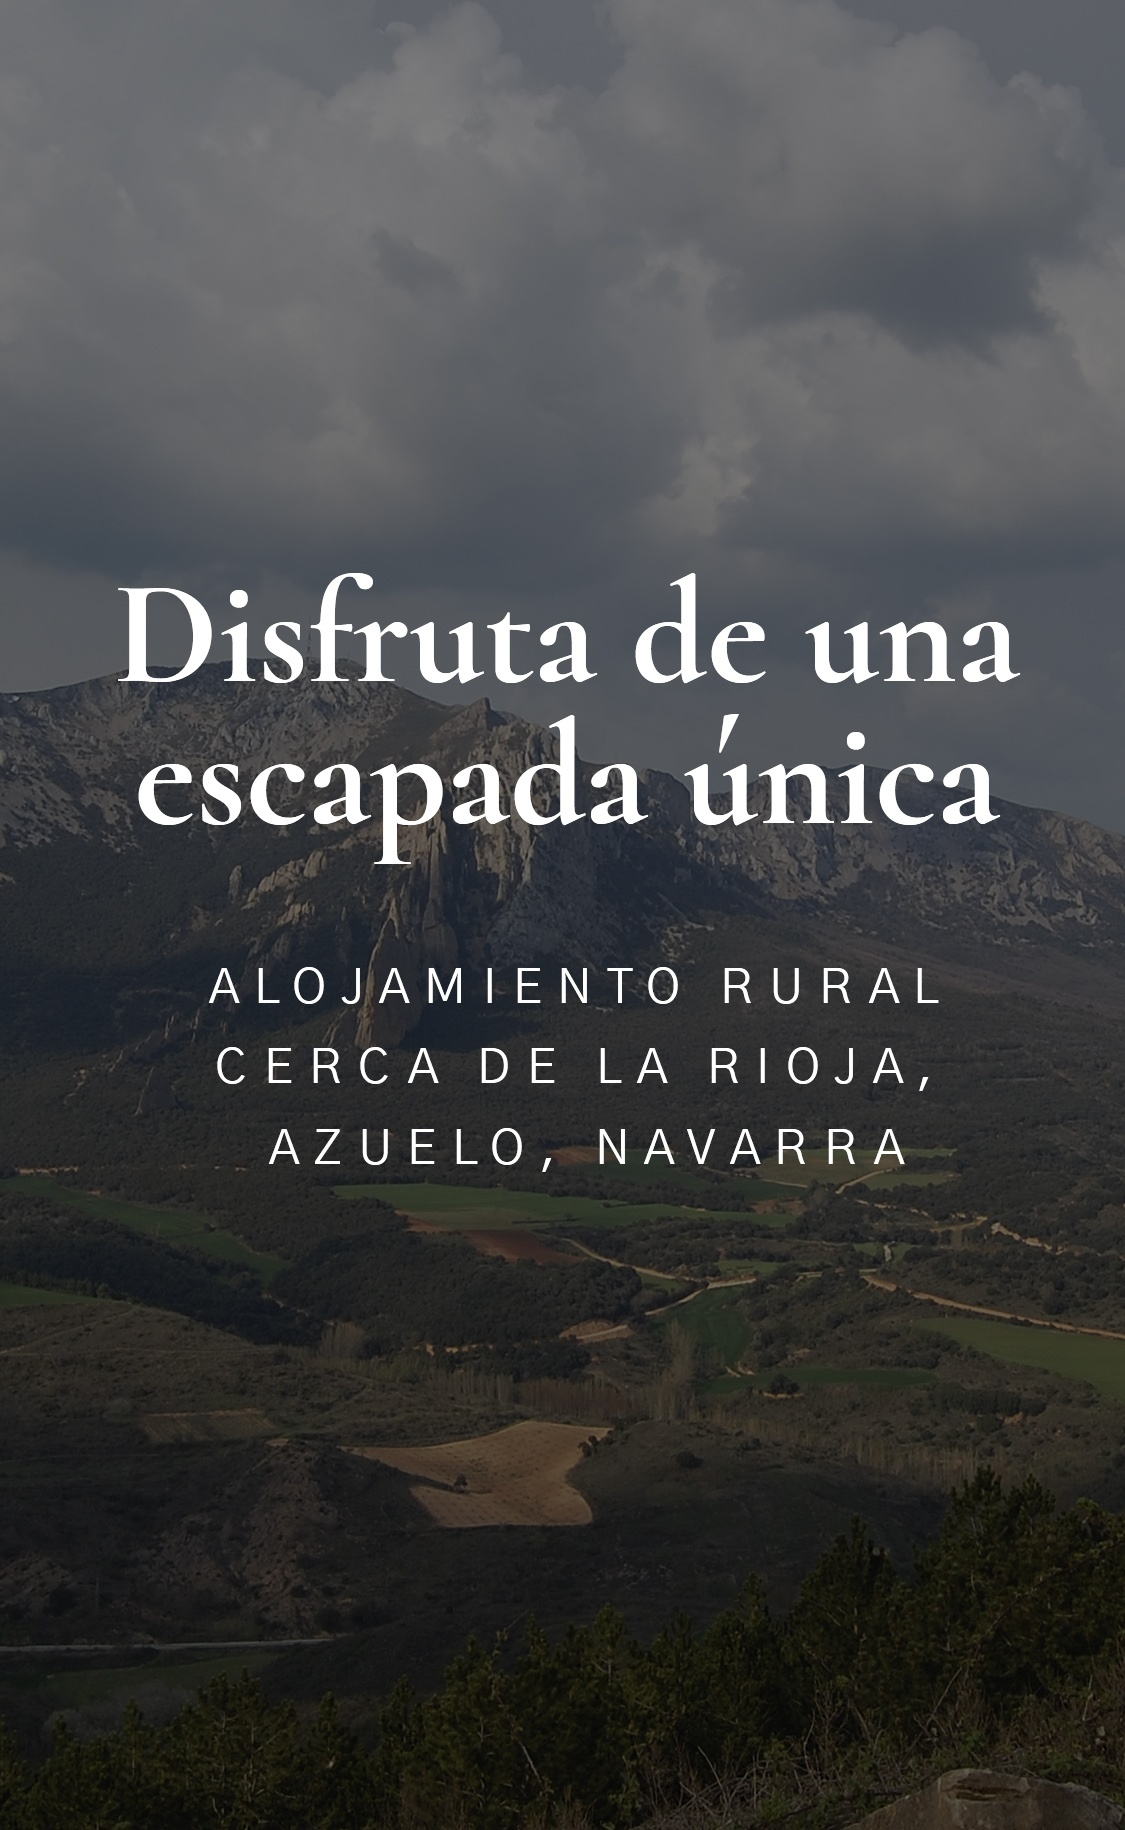 Casa rural La Rinconada en Azuelo Navarra Slider móvil